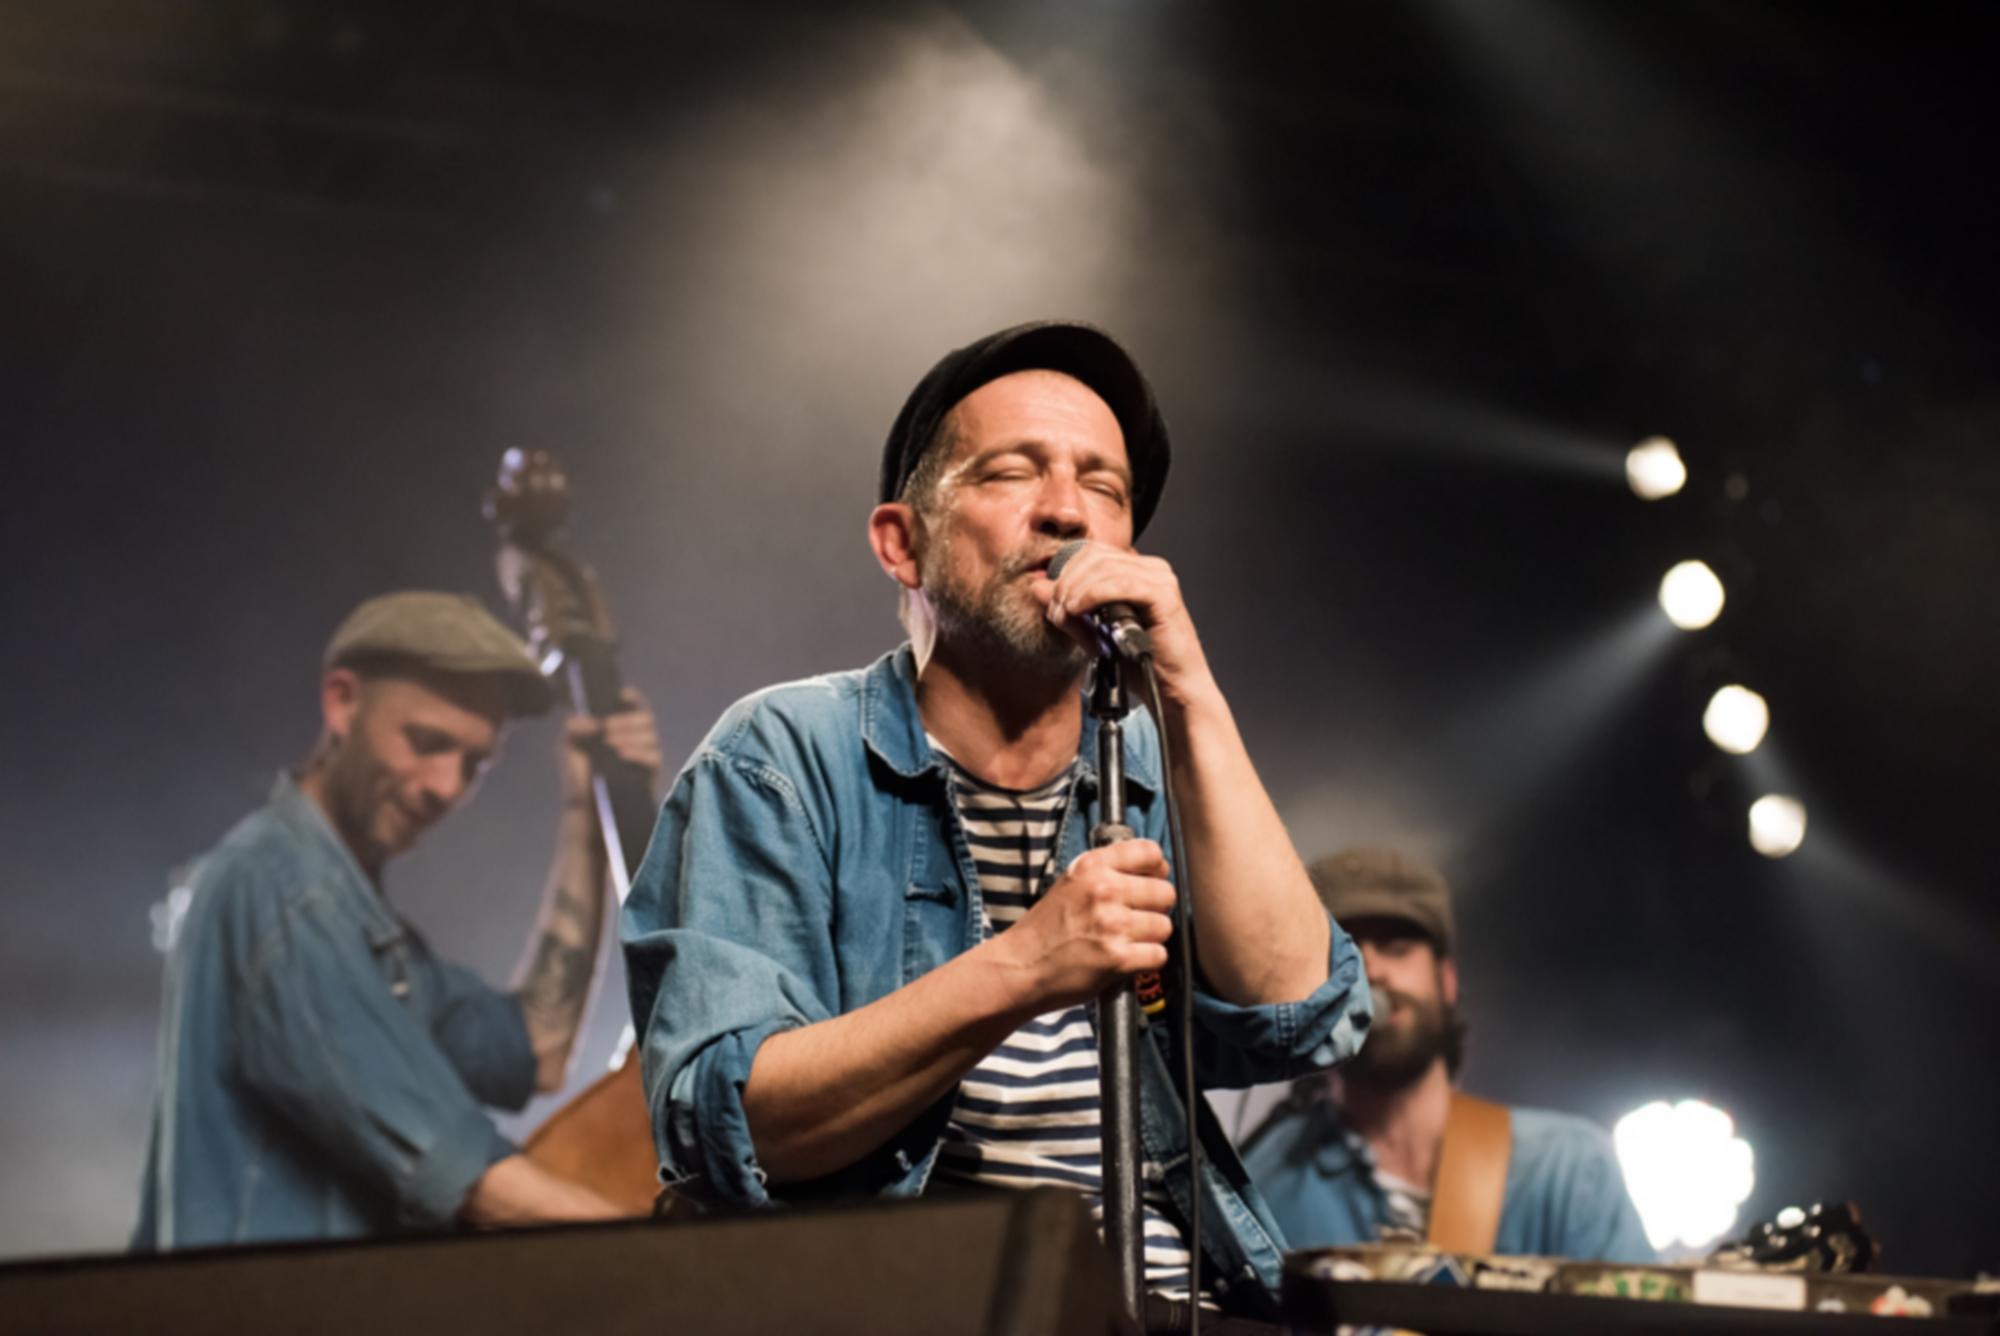 Tatou lors de Babel Med Music 2015 à Marseille. ©Jean de Pena